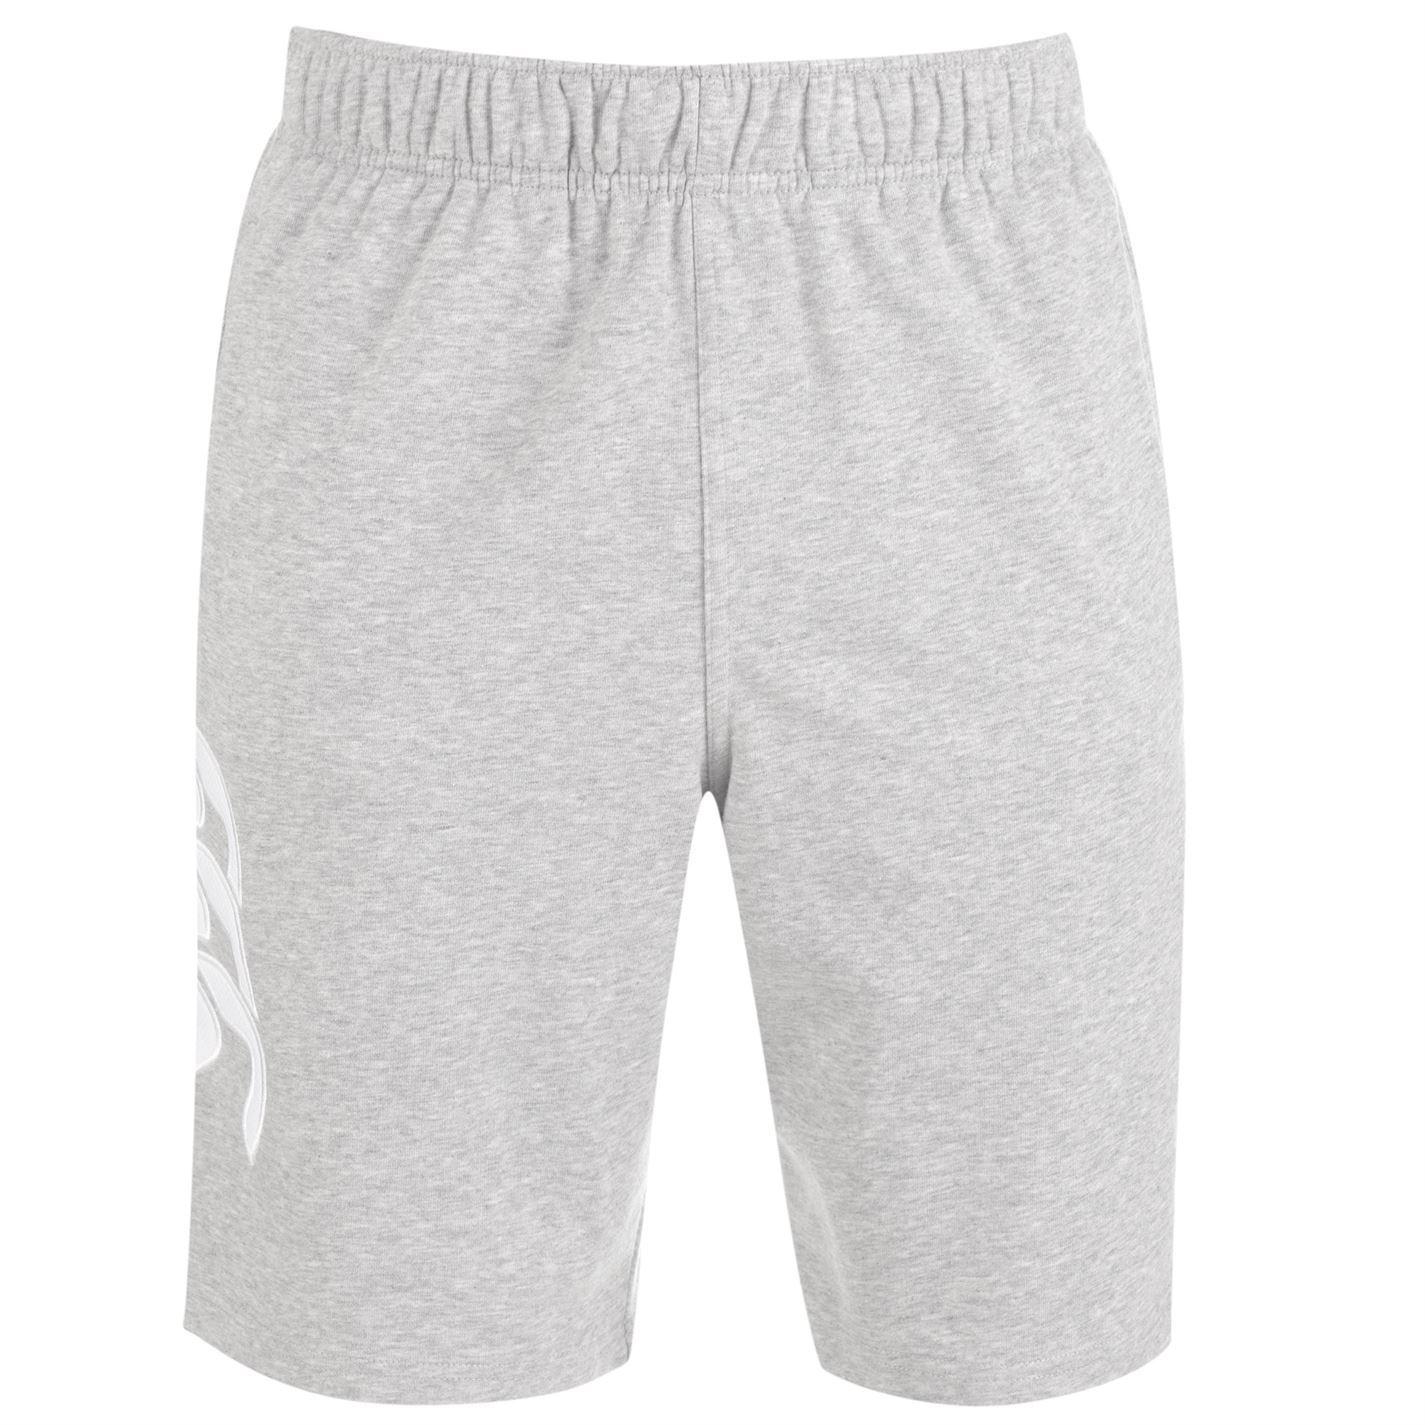 Canterbury CCC Fleece Shorts Mens Gents Pants Trousers Bottoms  0c81a827a9